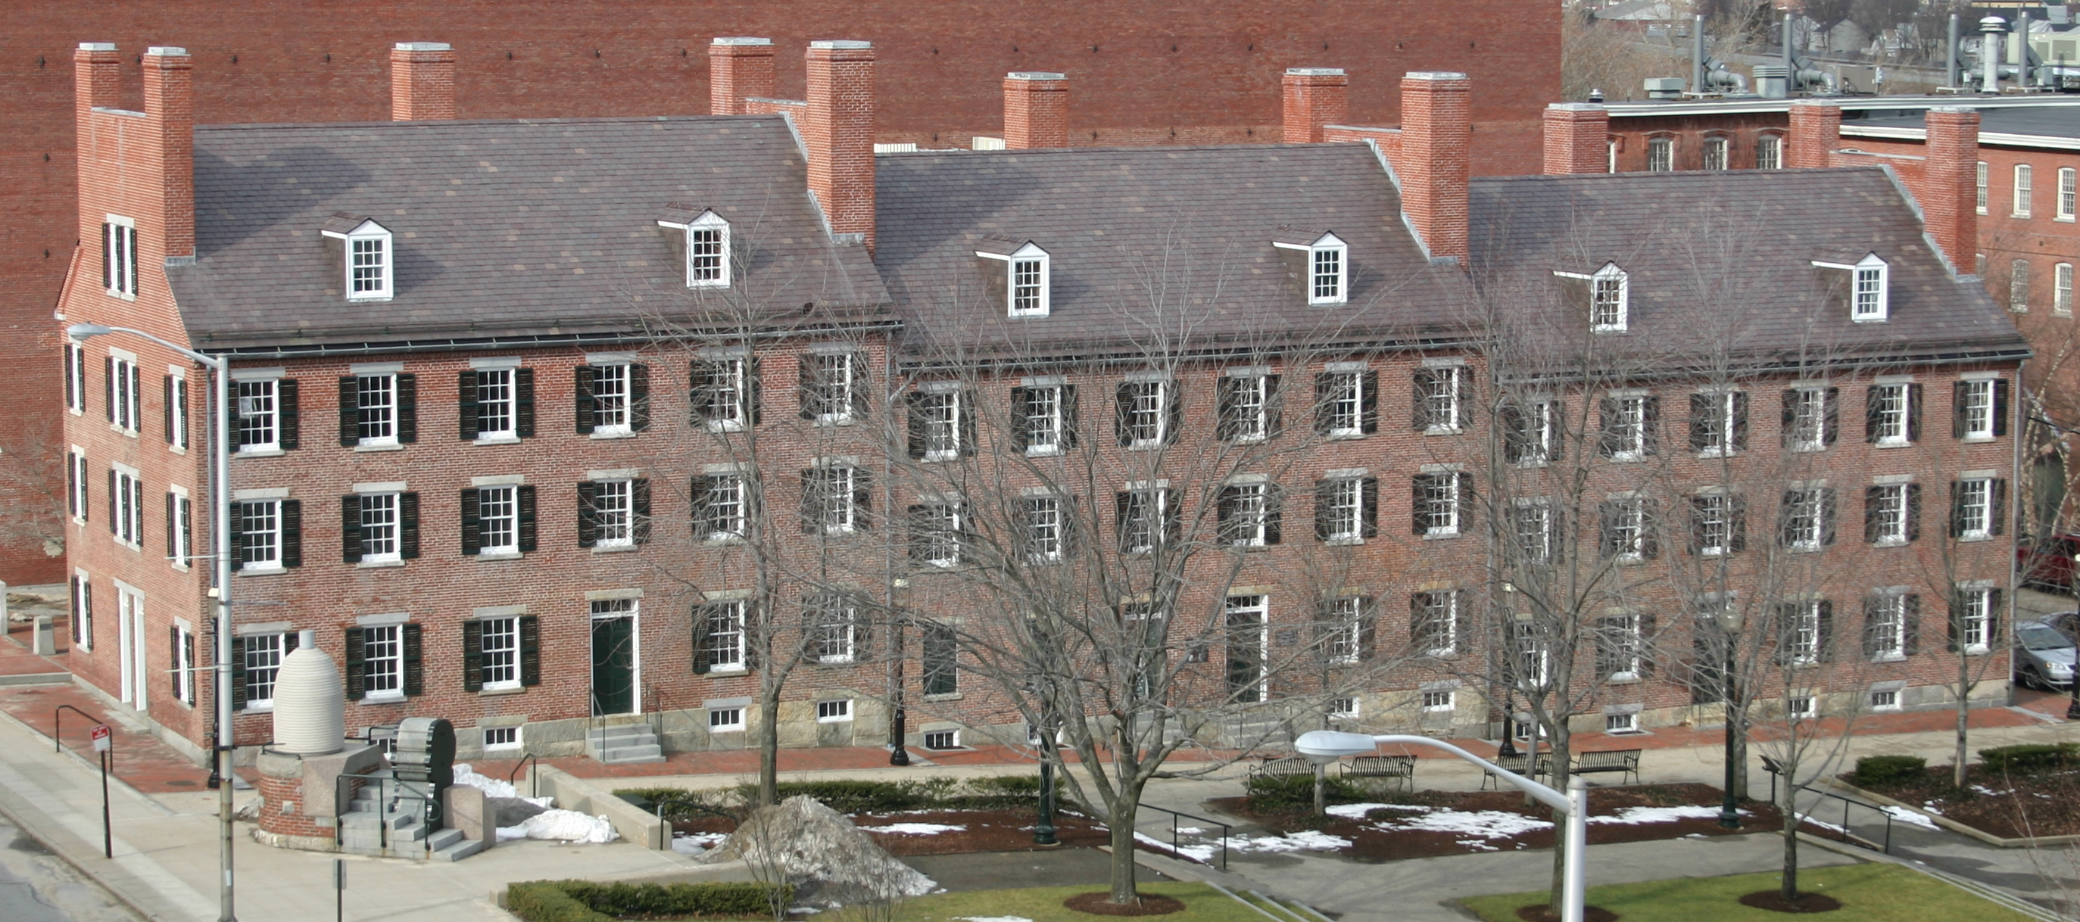 Boott Cotton Mills' Boarding House, Lowell, Massachusetts